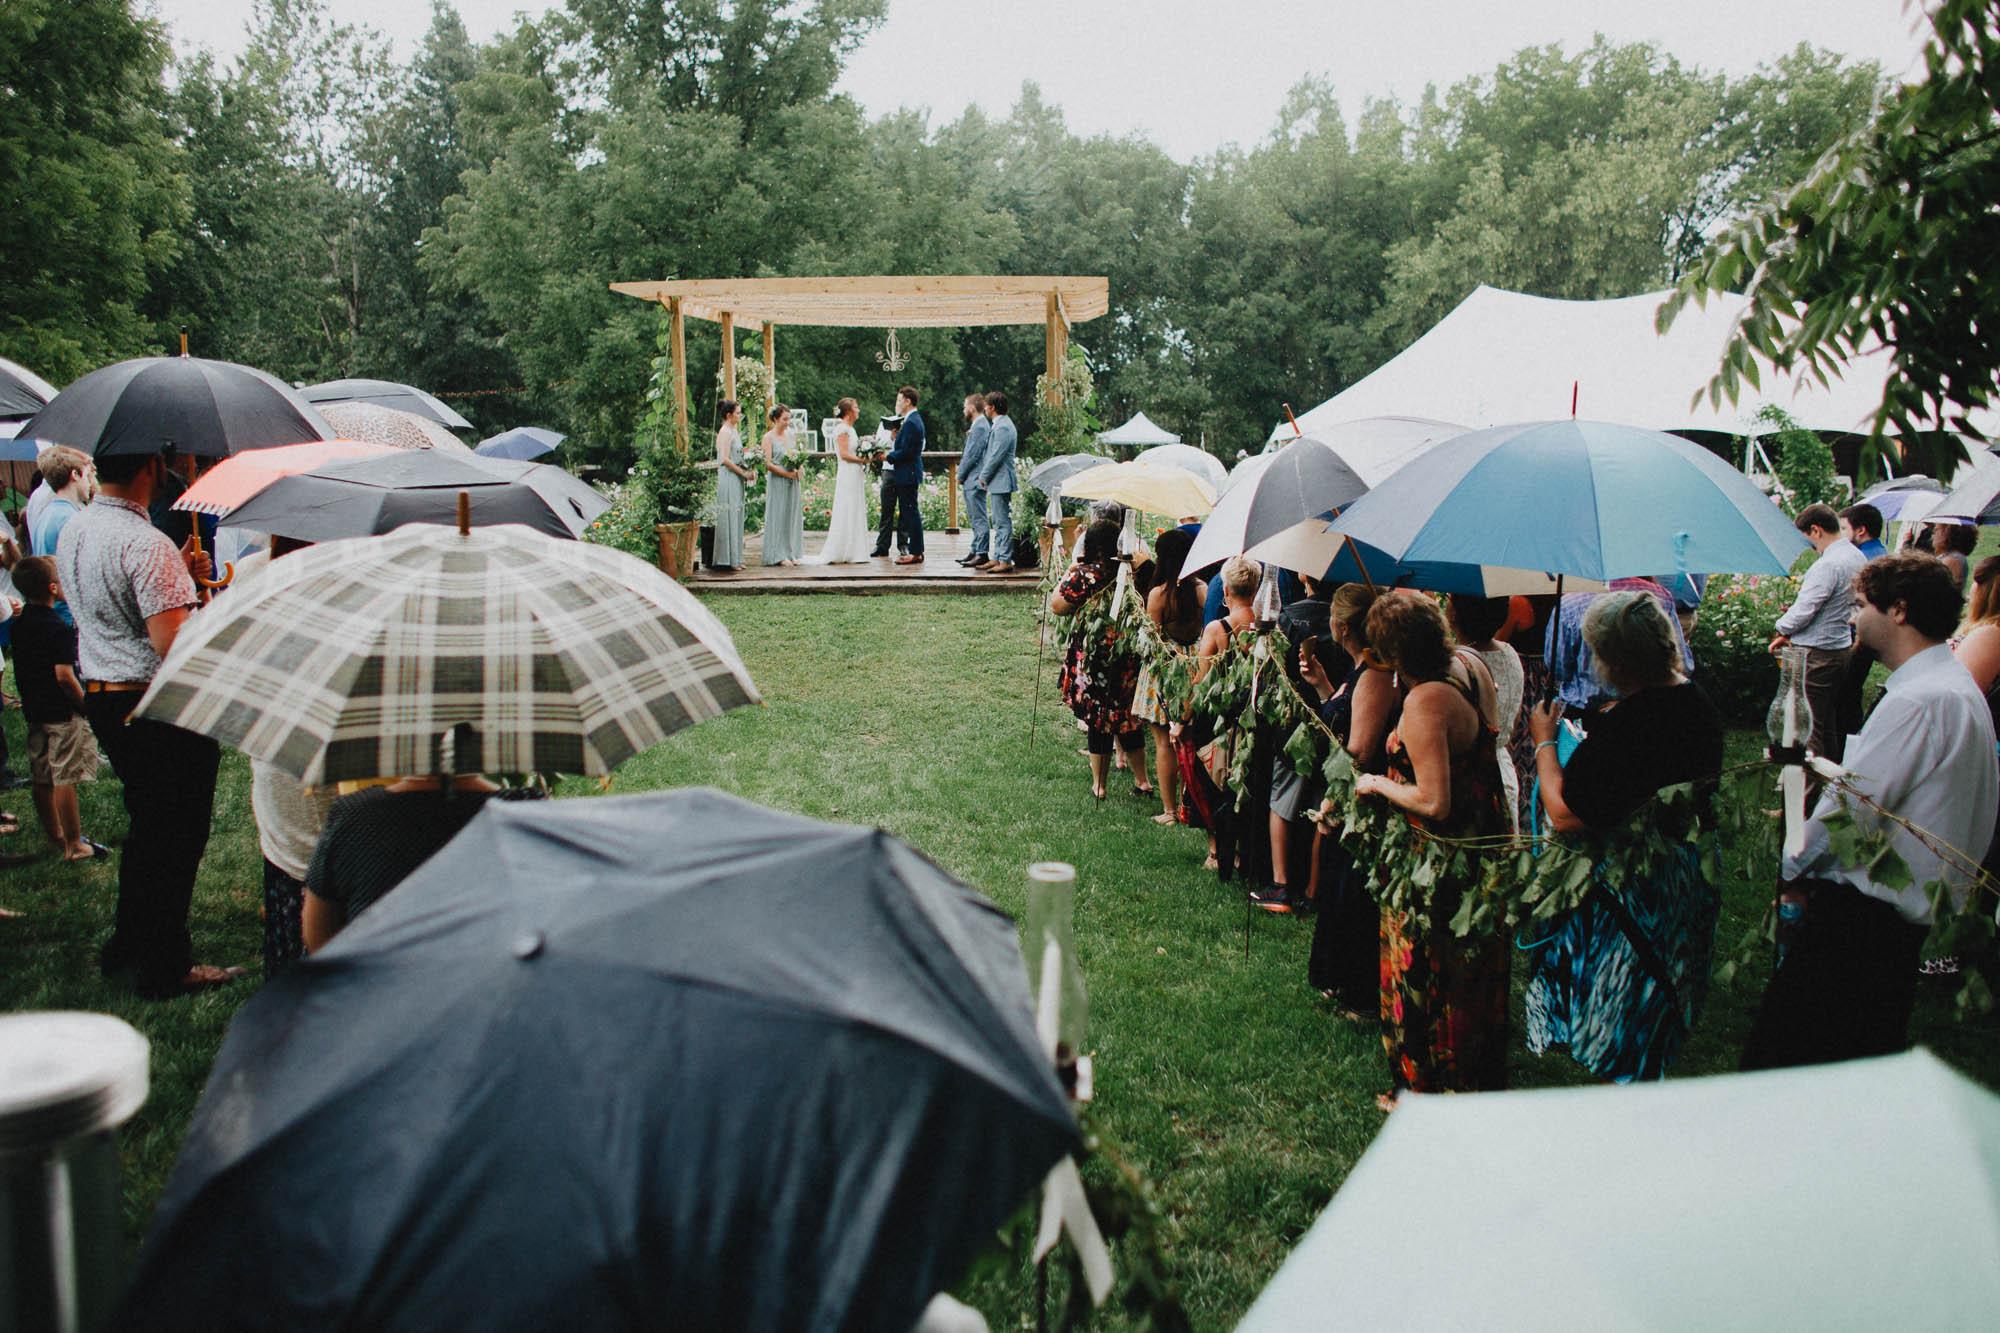 Leah-Graham-Michigan-Outdoor-DIY-Wedding-049@2x.jpg